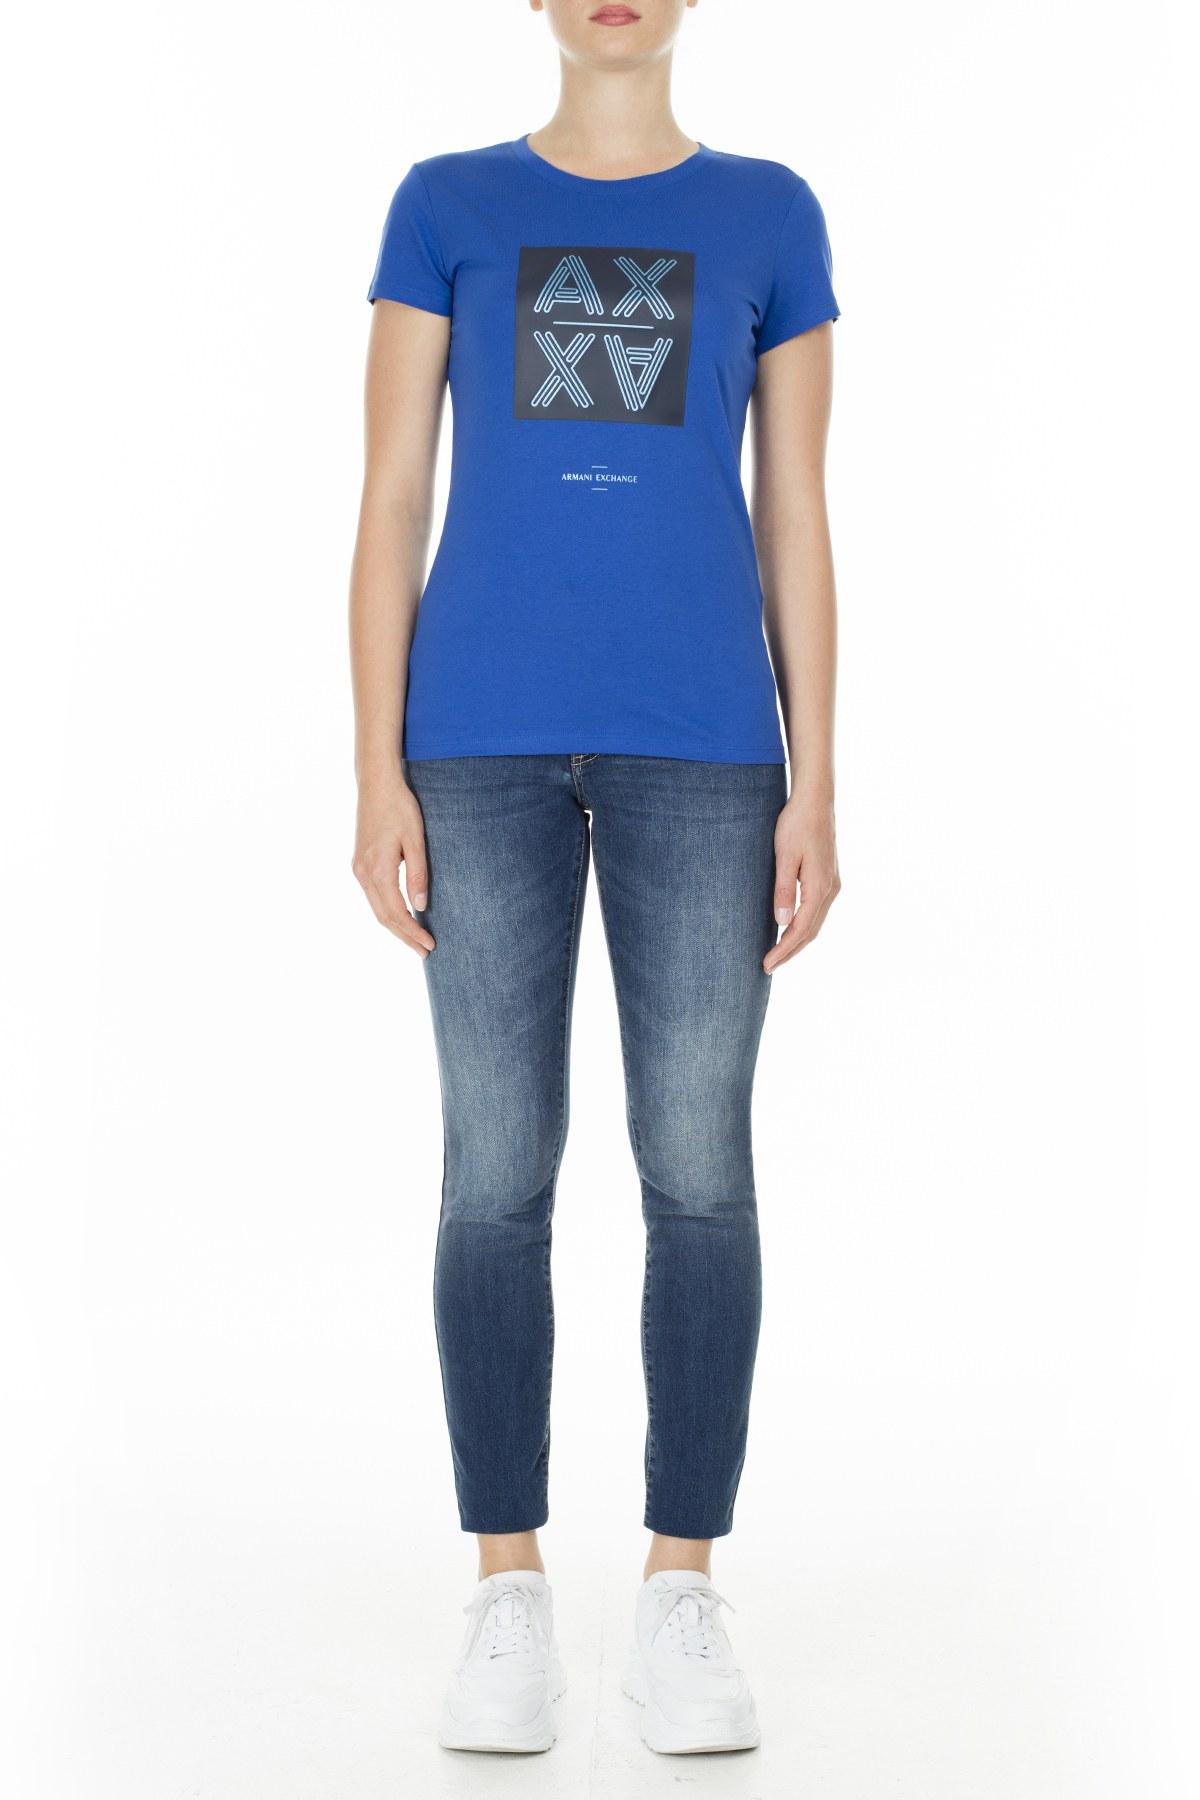 Armani Exchange Kadın T Shirt 3HYTAQ YJ73Z 1517 TURKUAZ